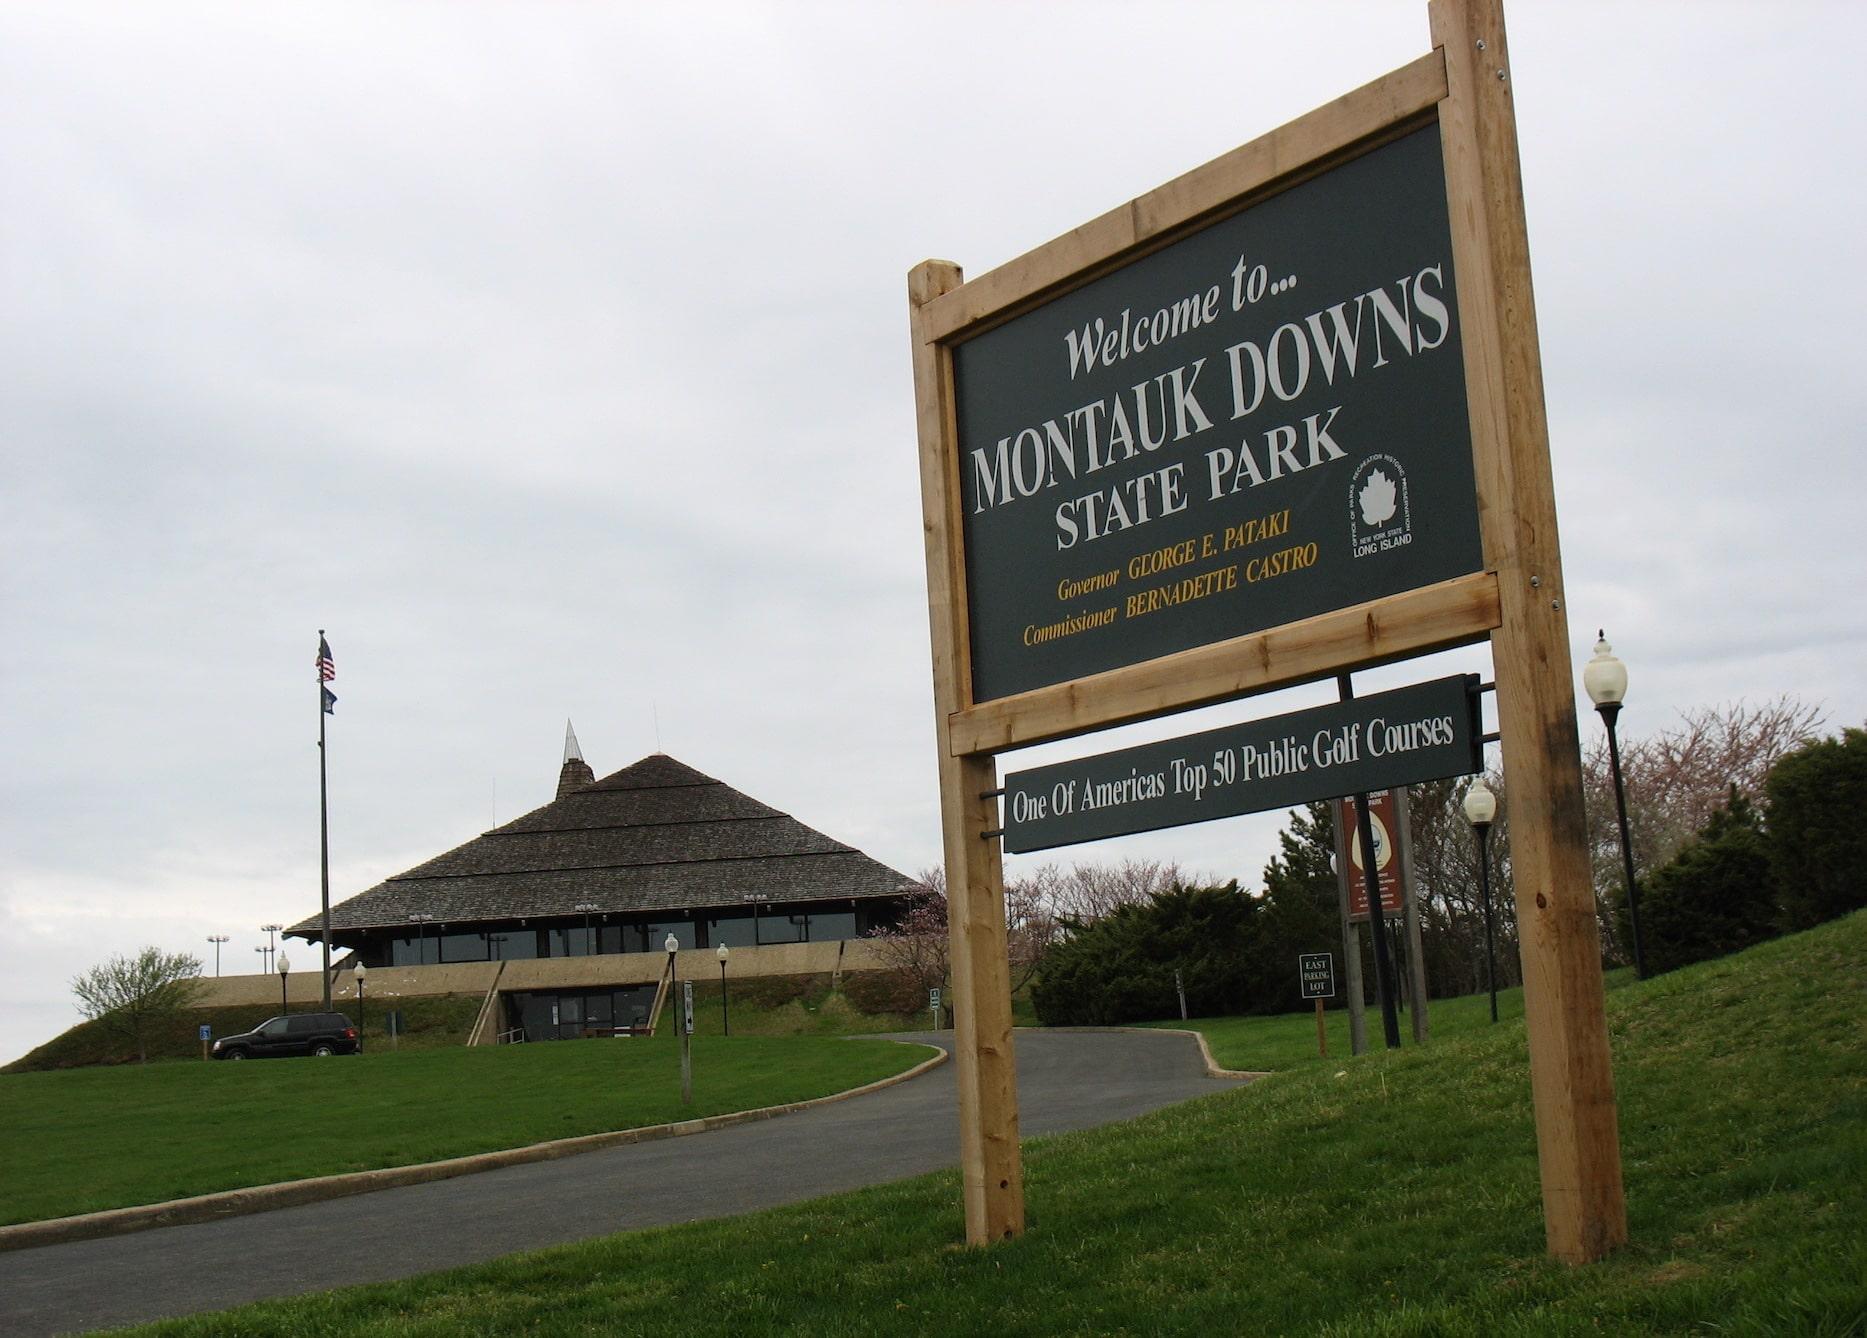 Montauk Downs State Park